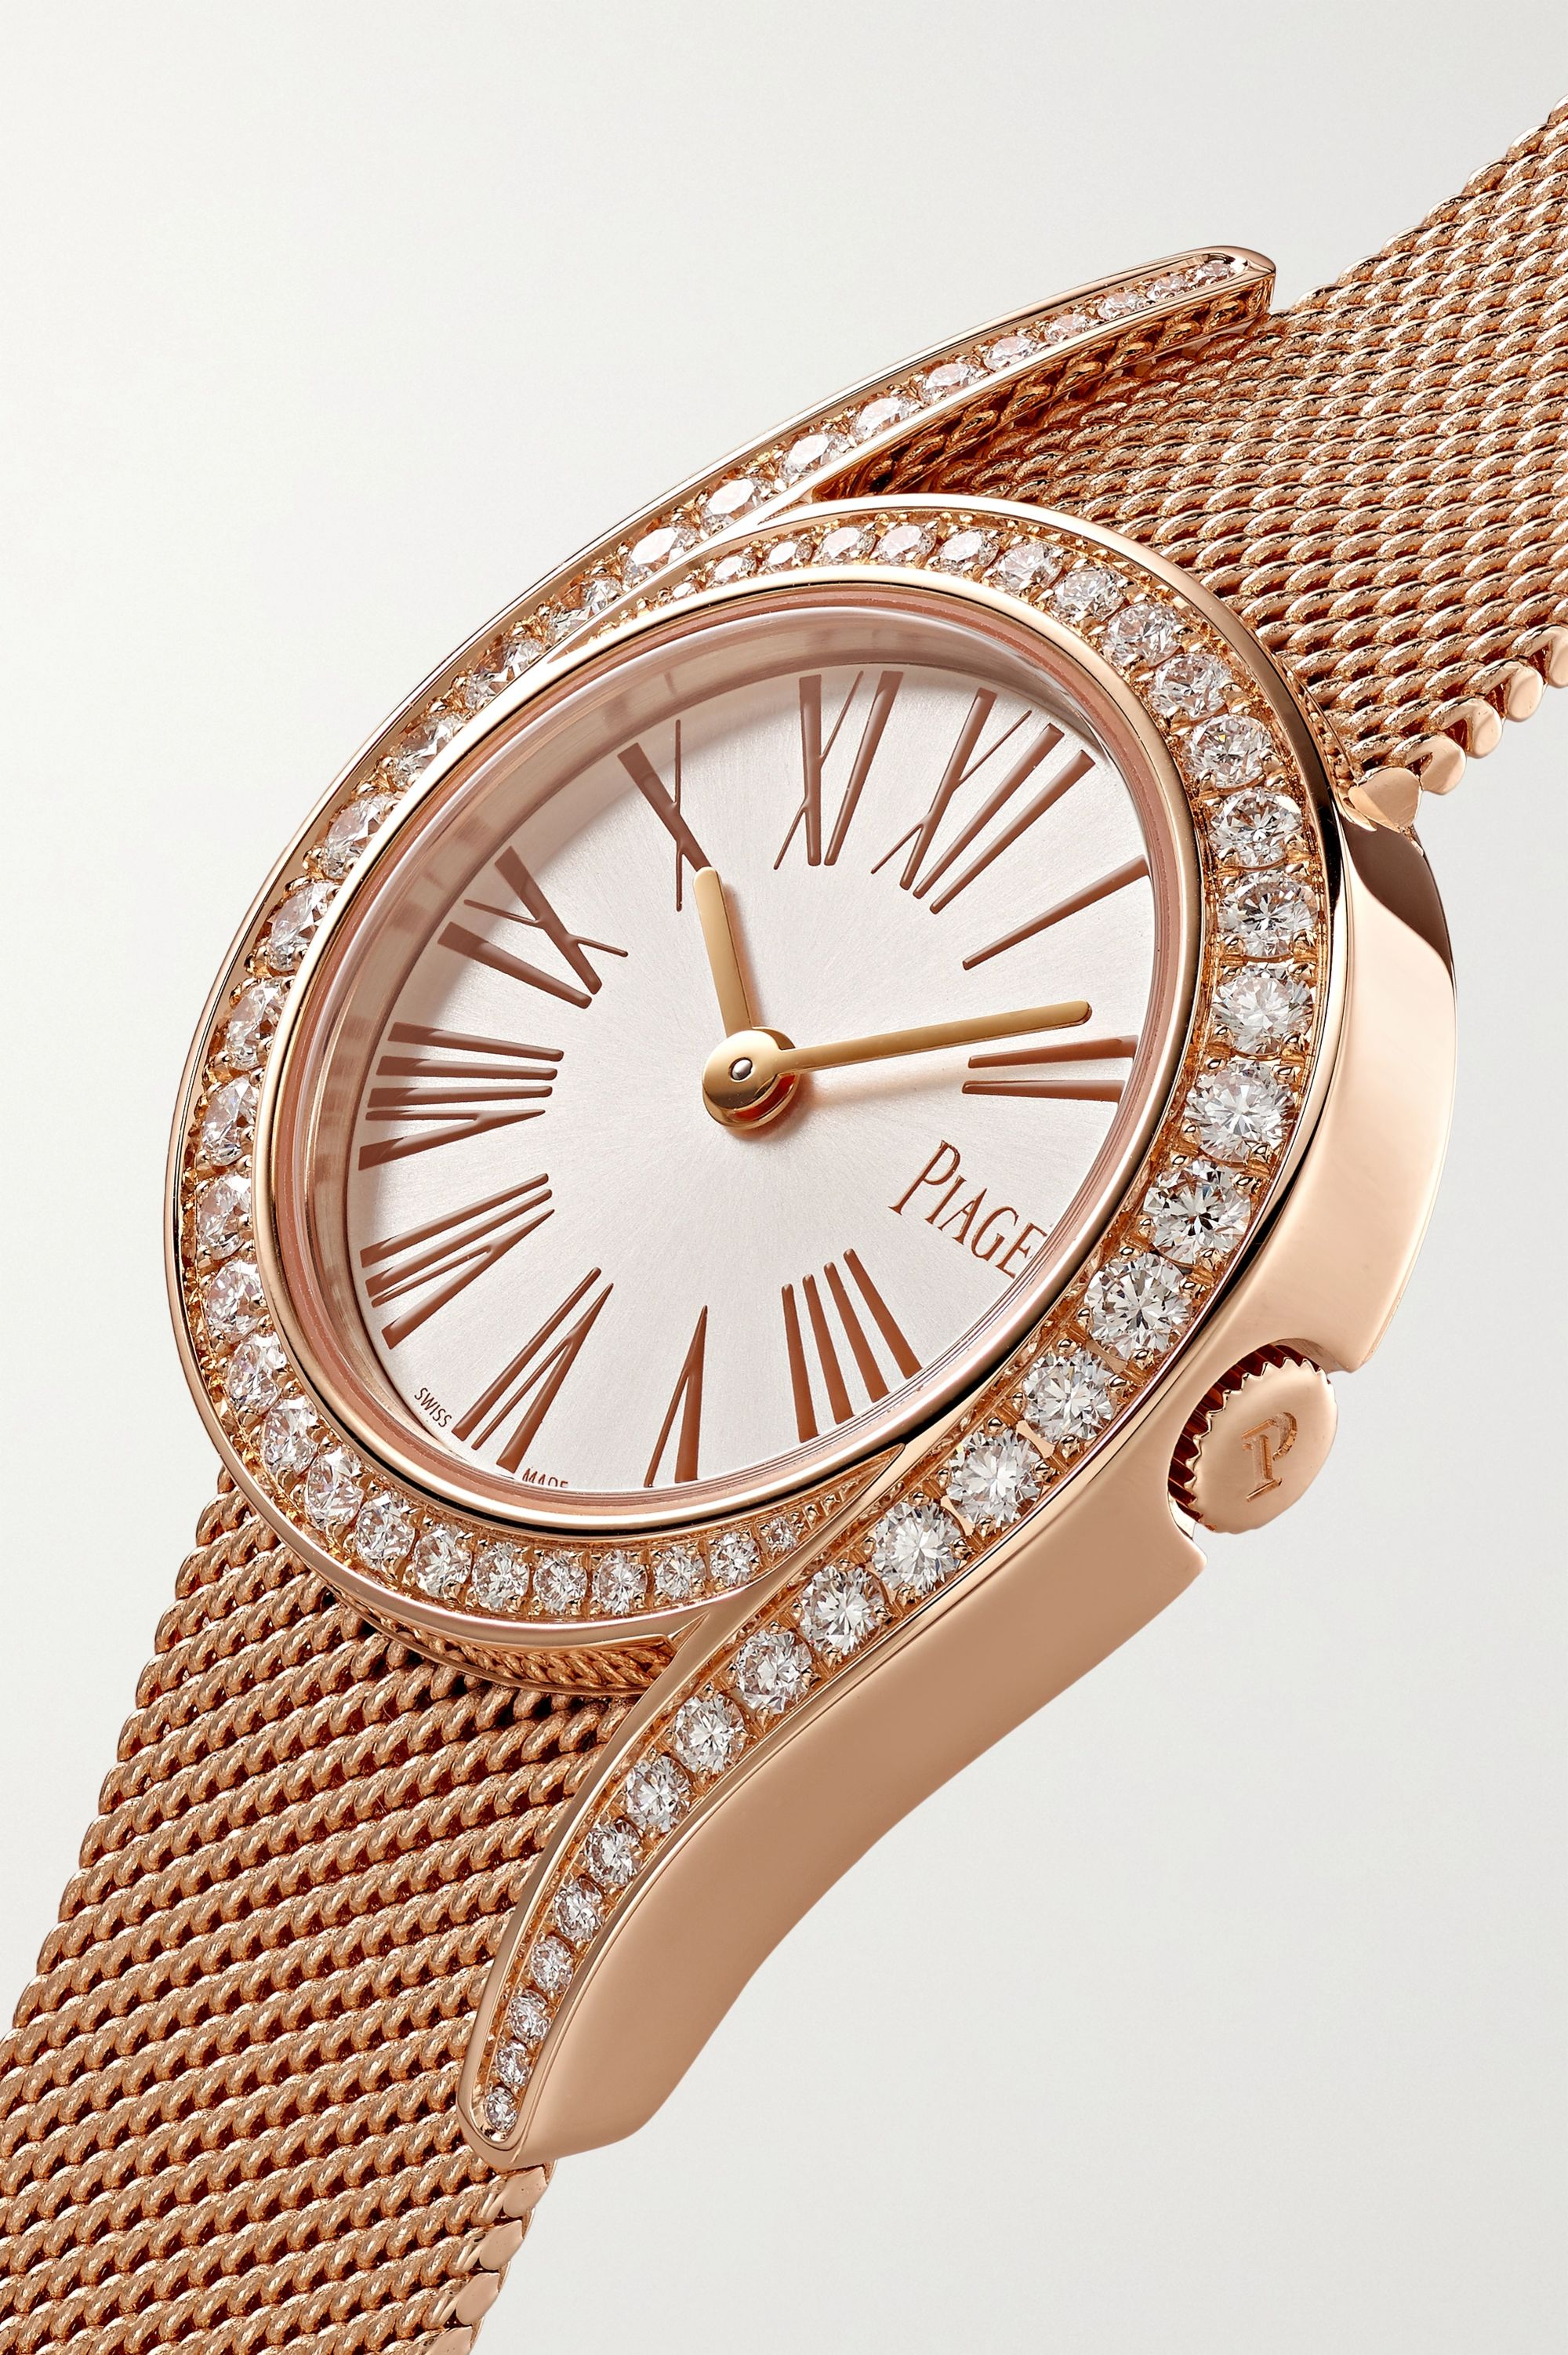 Piaget Limelight Gala 26mm 18-karat rose gold and diamond watch